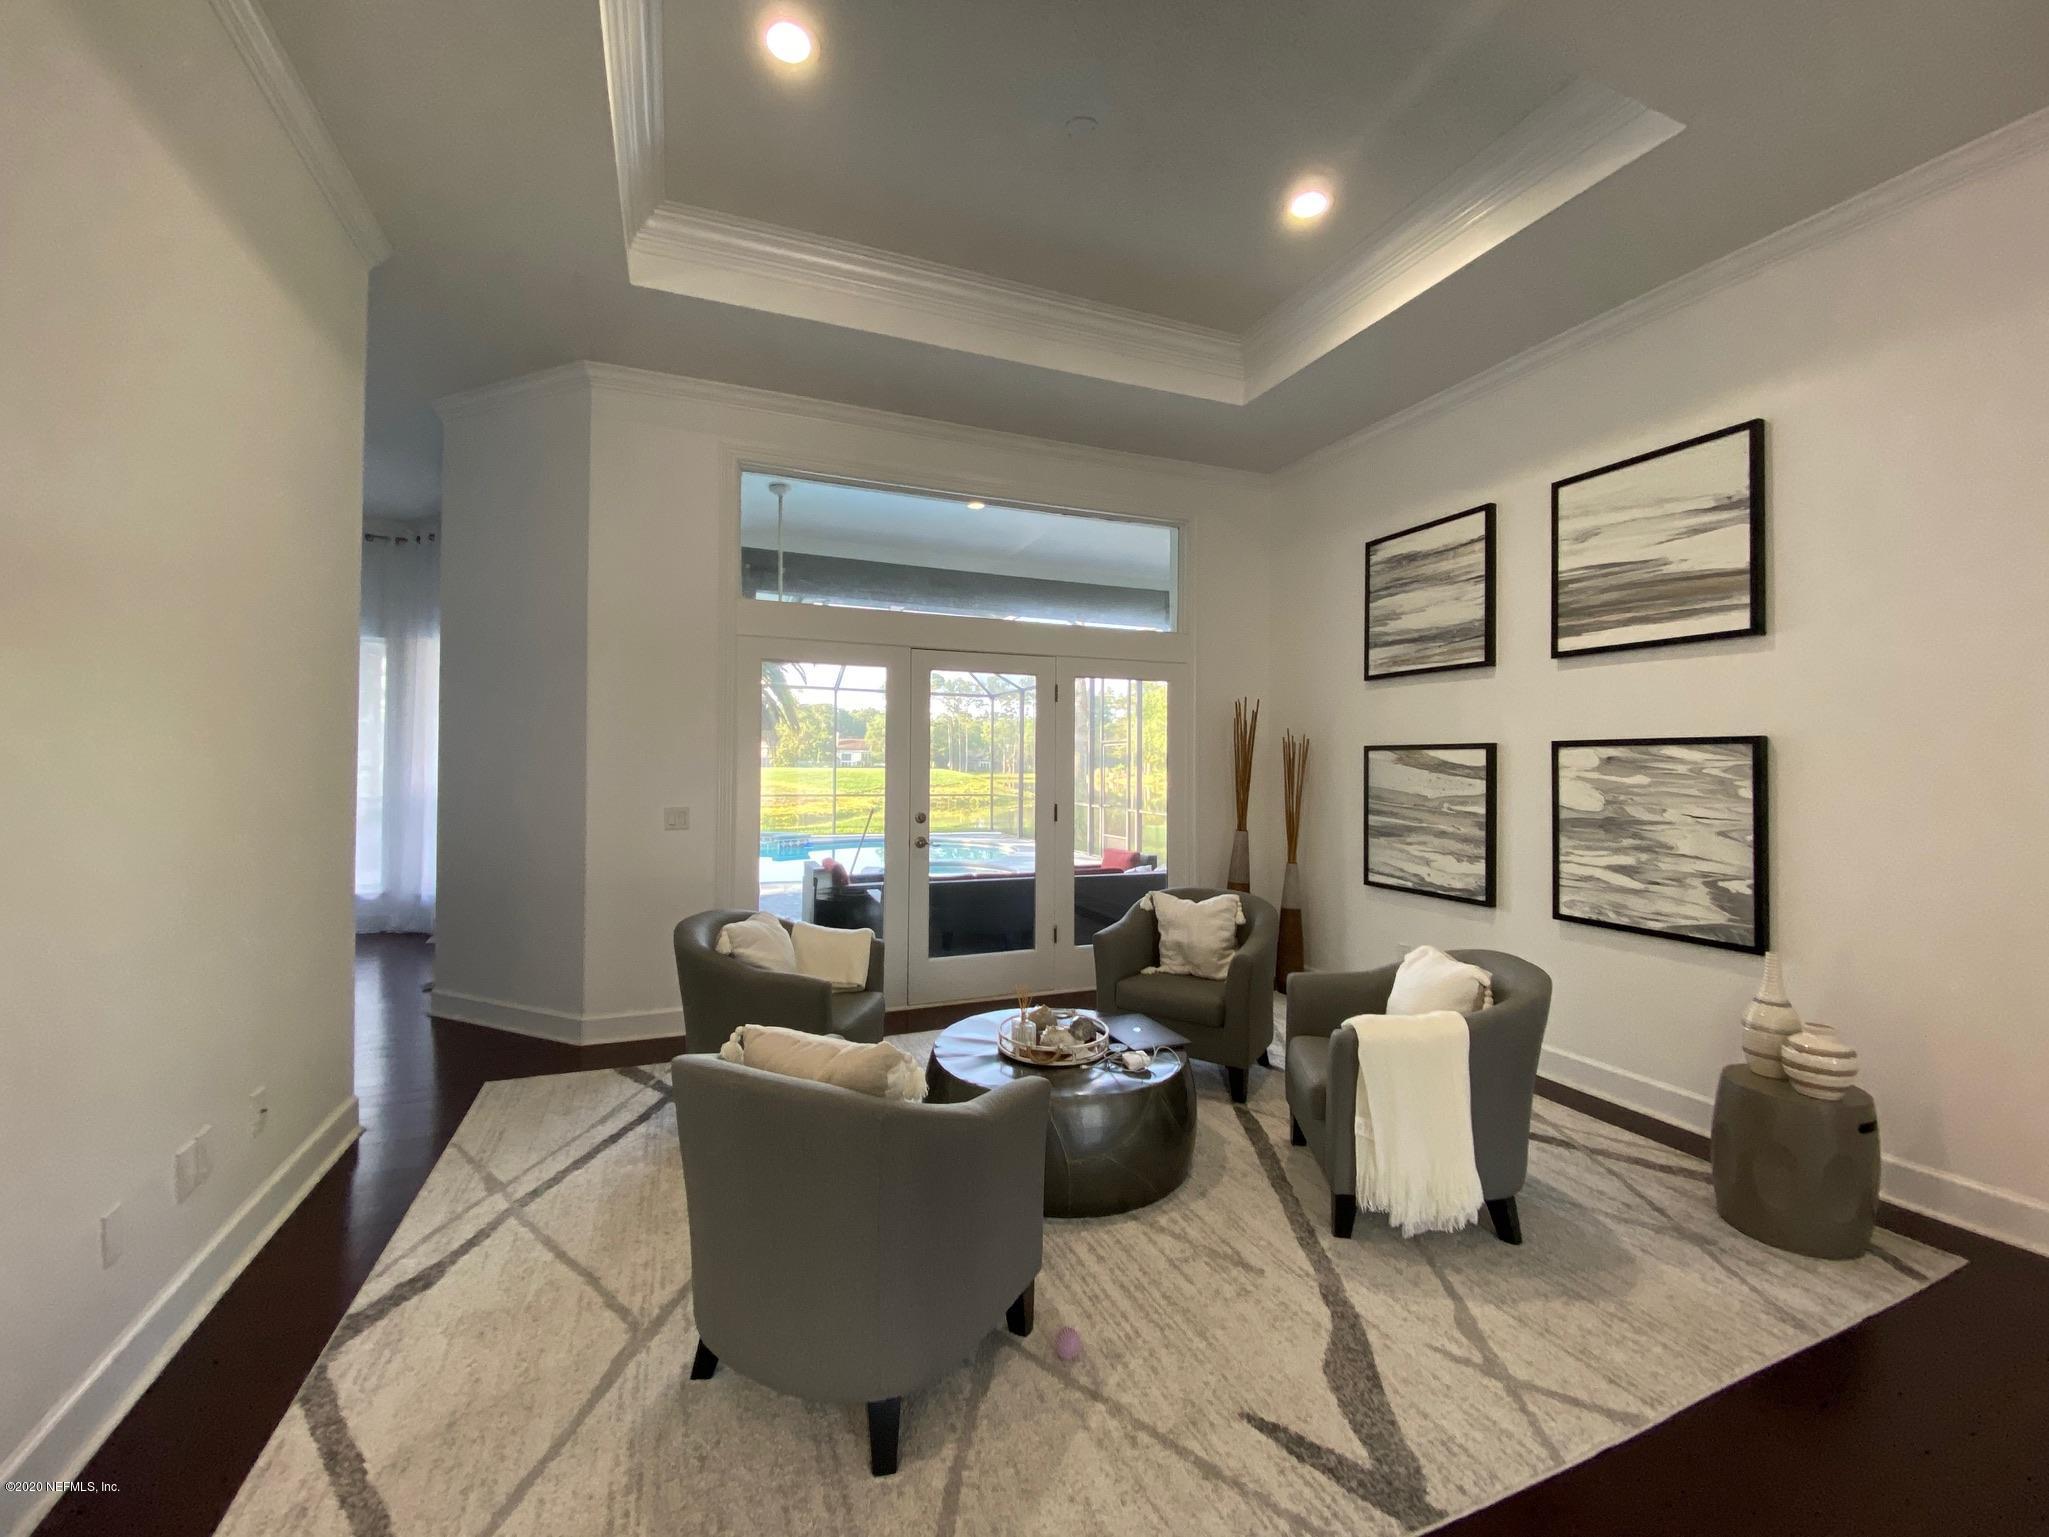 1134 SALT CREEK, PONTE VEDRA BEACH, FLORIDA 32082, 5 Bedrooms Bedrooms, ,4 BathroomsBathrooms,Residential,For sale,SALT CREEK,1055109